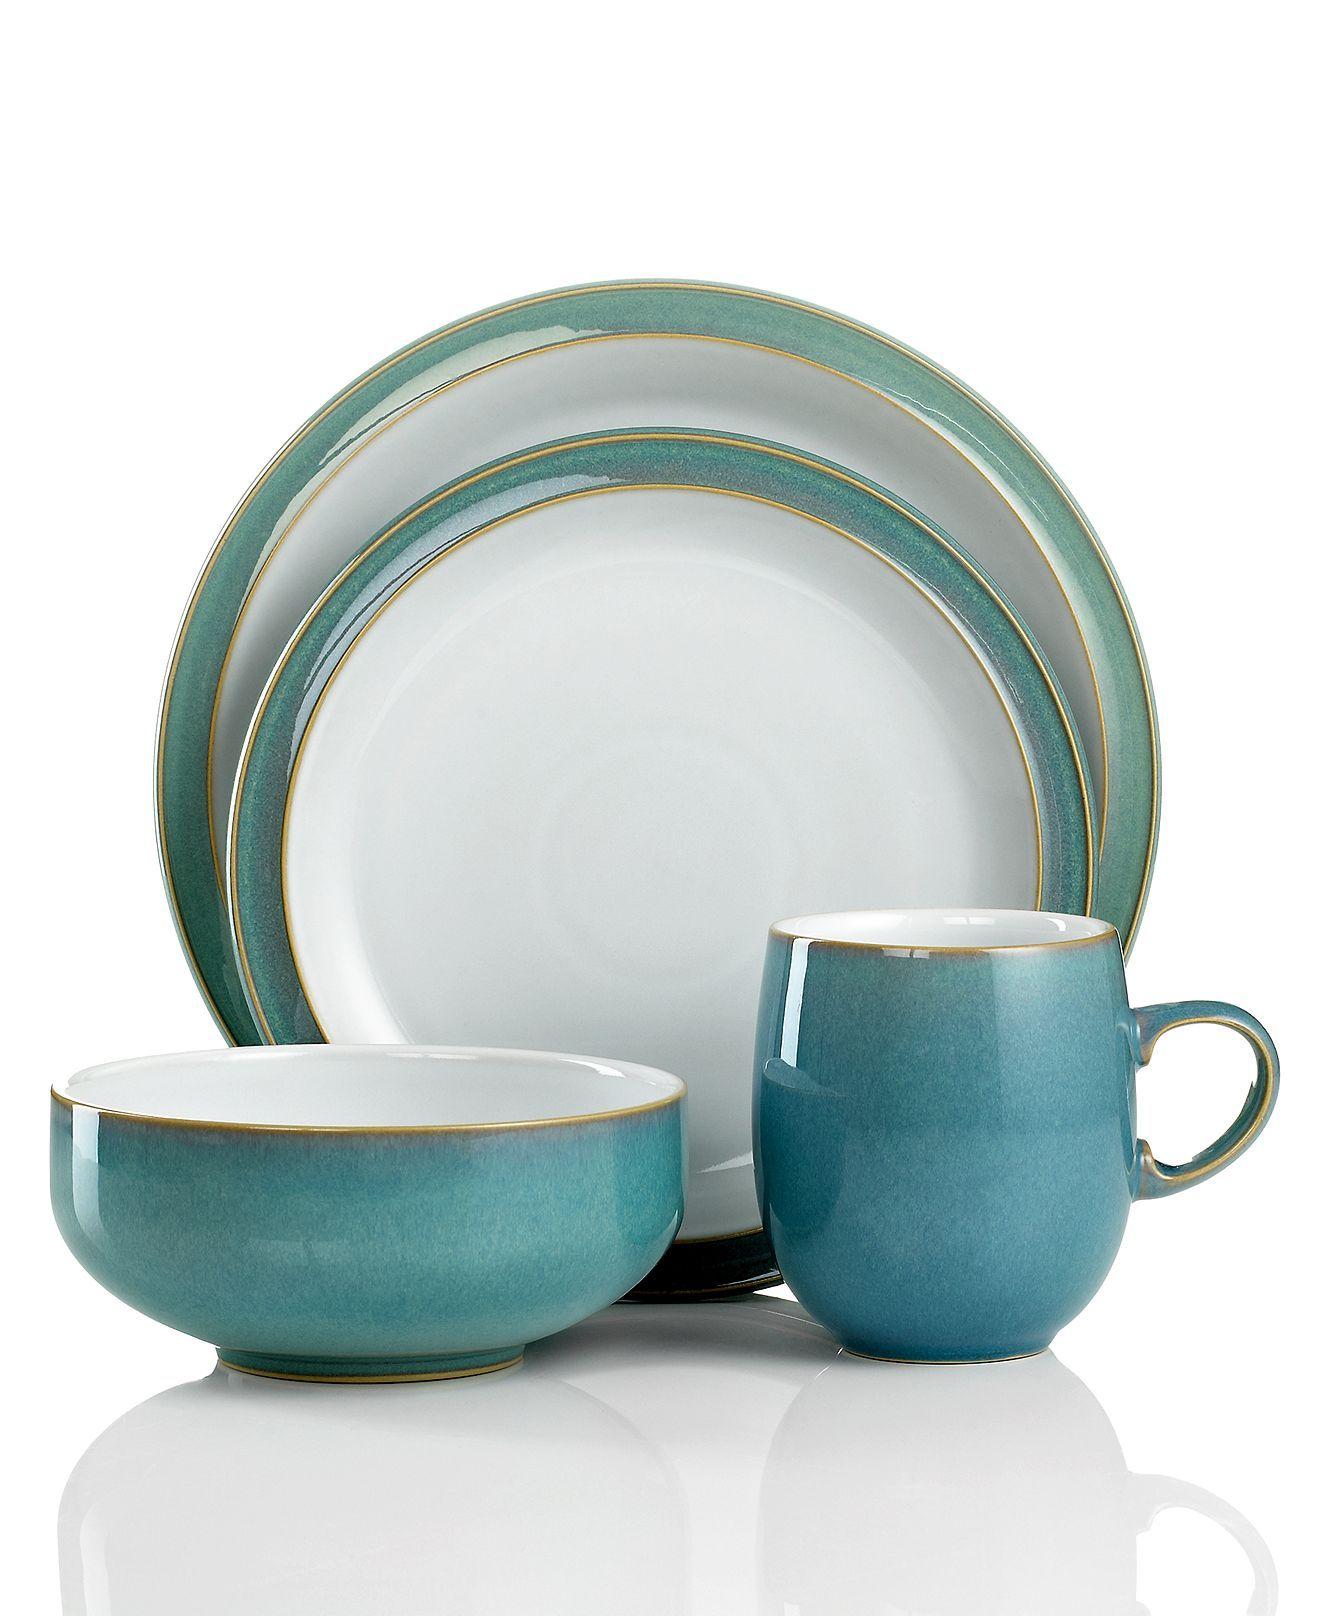 denby dinnerware azure 4 piece place setting dinnerware. Black Bedroom Furniture Sets. Home Design Ideas